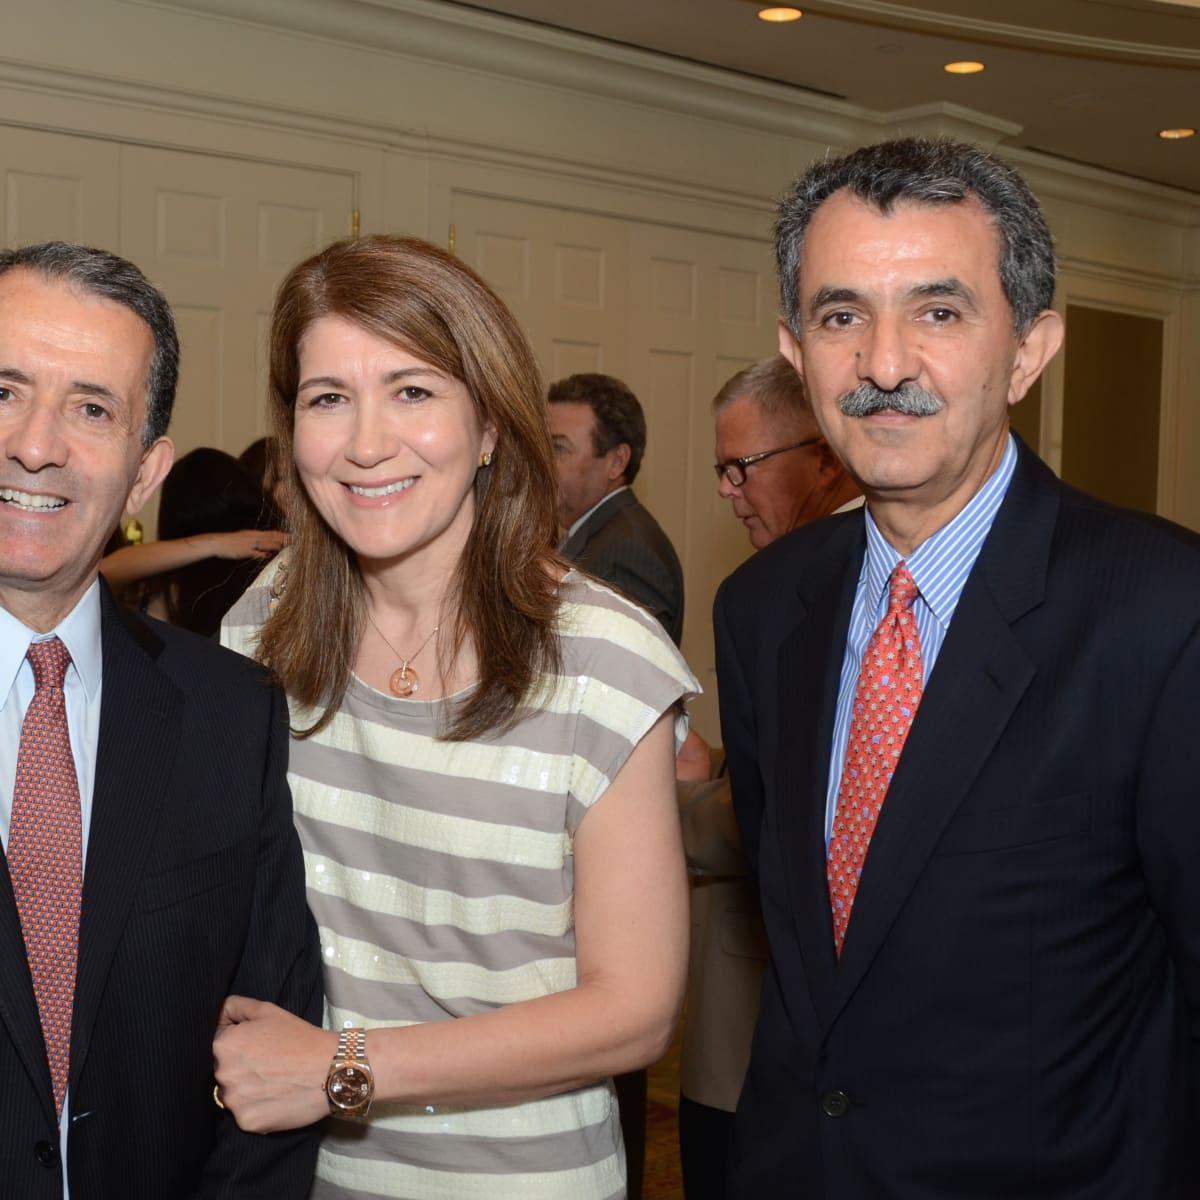 PDAP event Sept 2015 Zin & Nora Zmati, Chair Ali Saberioon